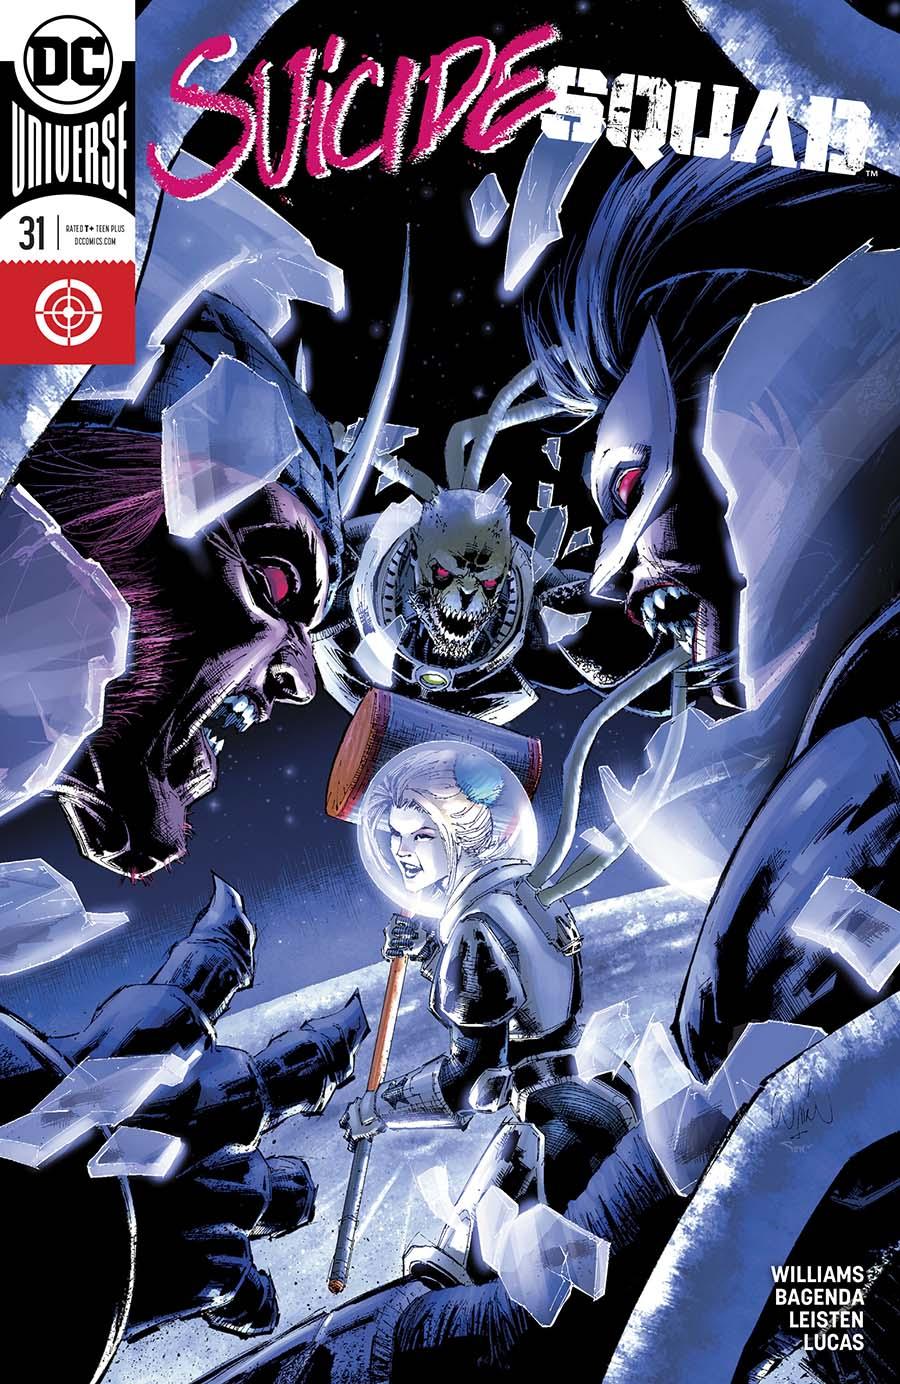 Suicide Squad Vol 4 #31 Cover B Variant Whilce Portacio Cover